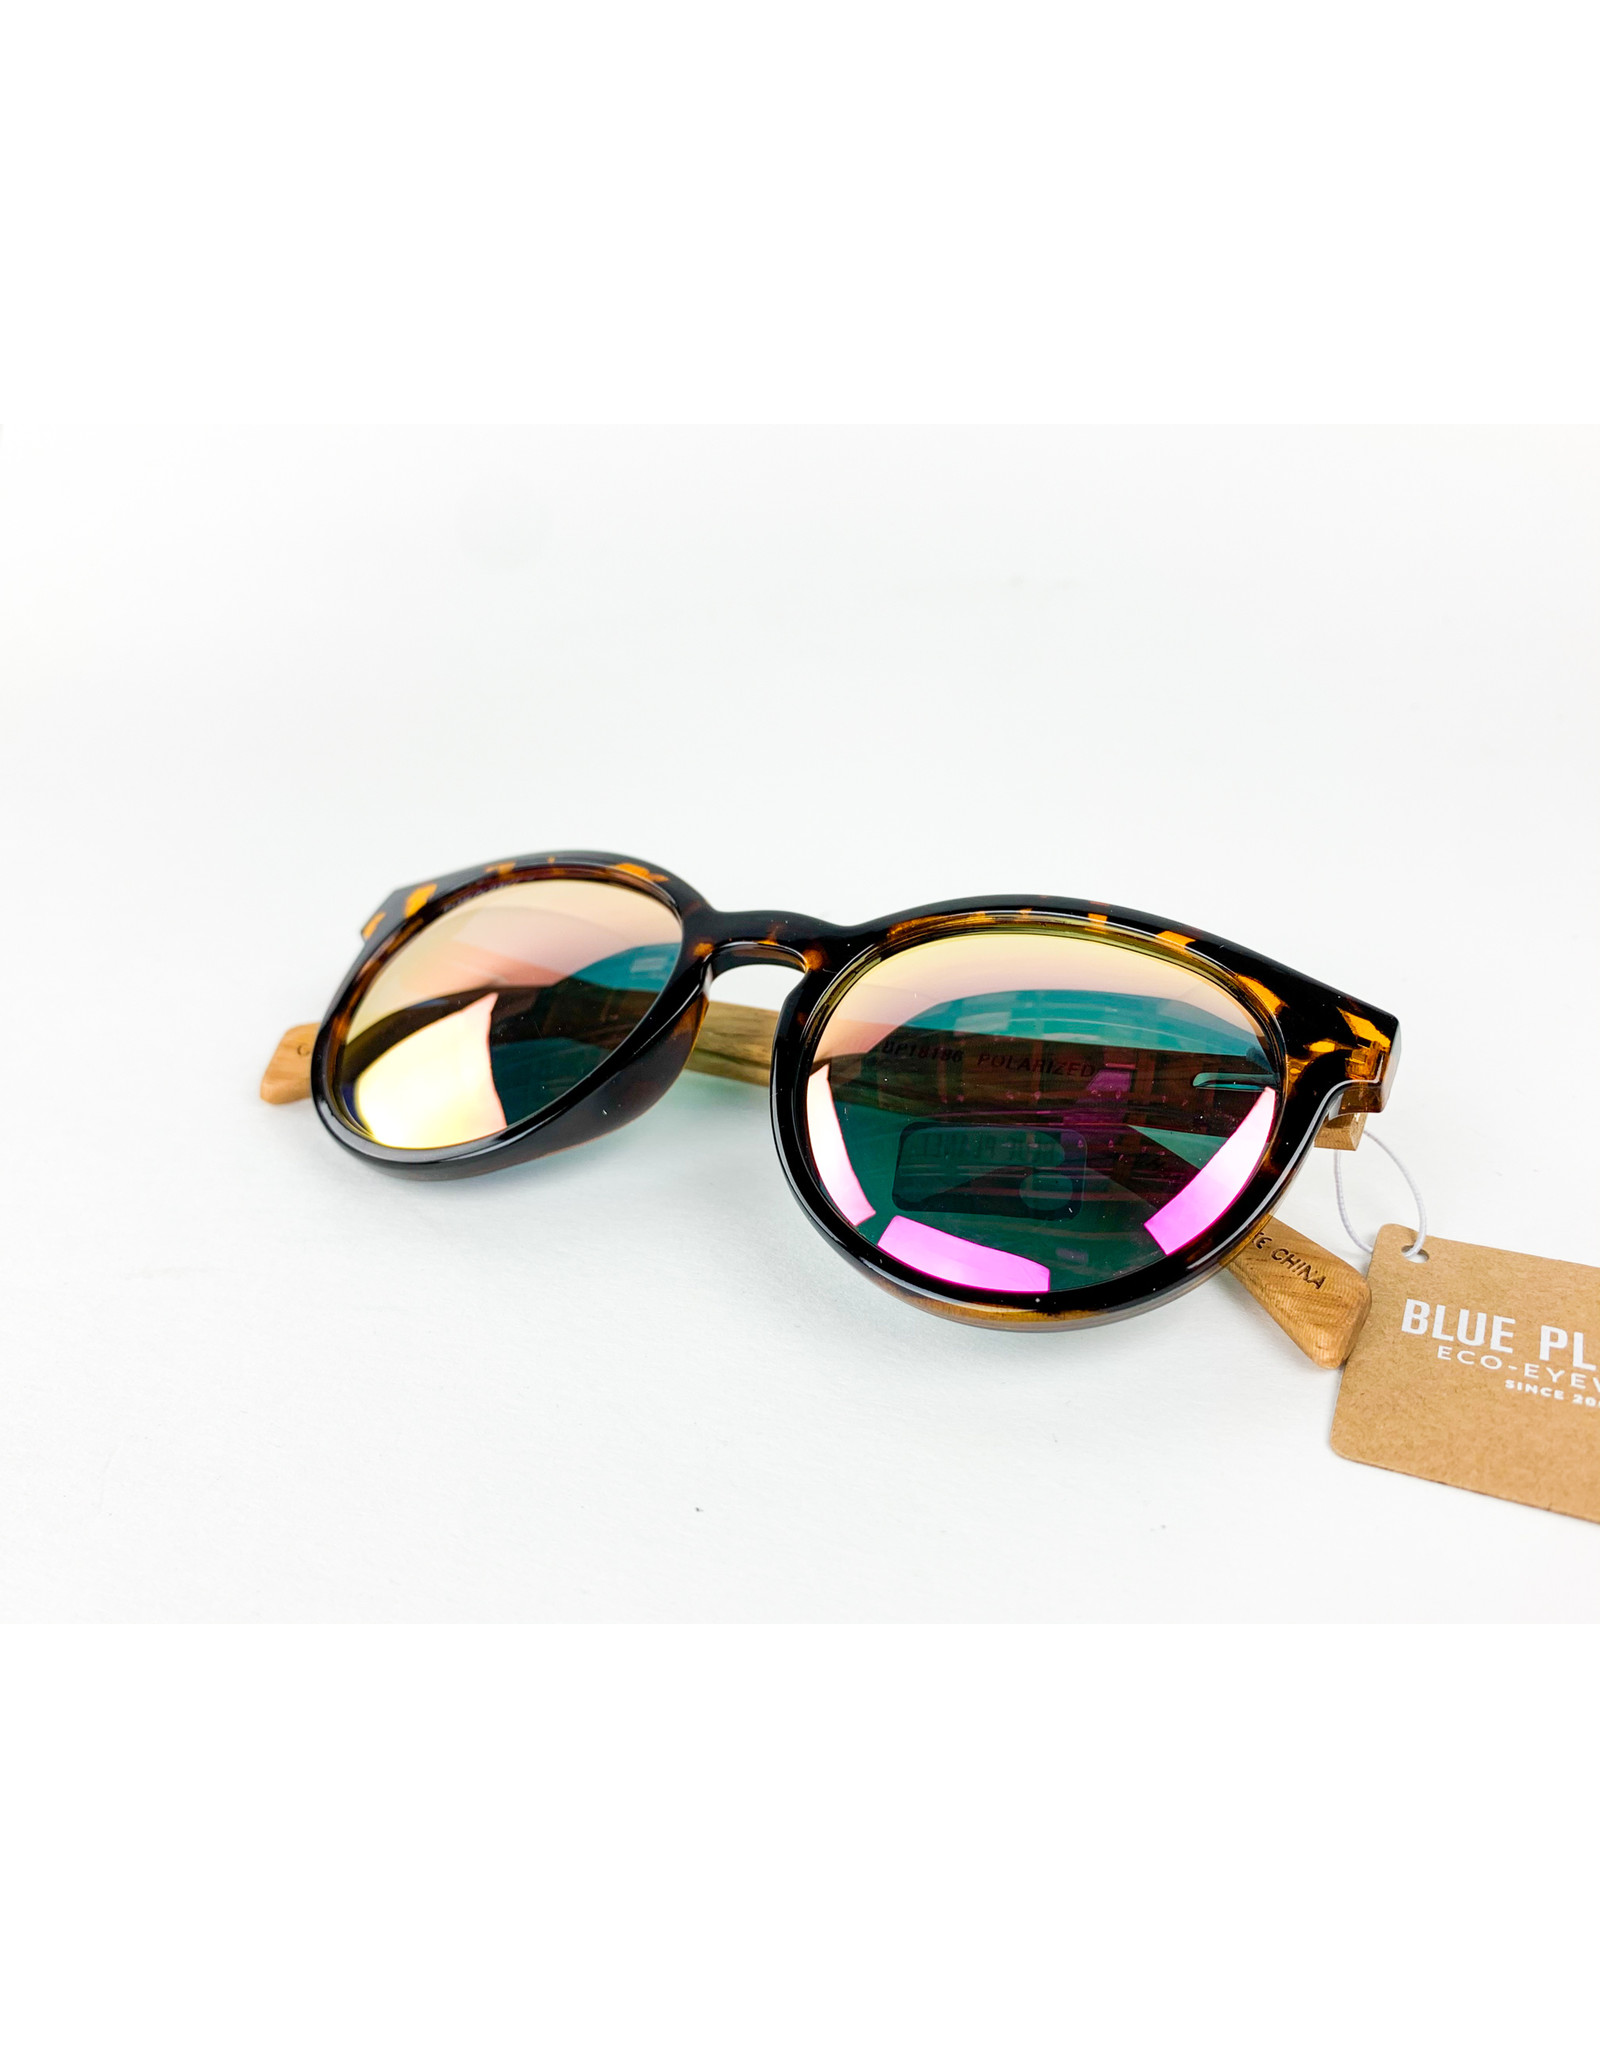 Blue Planet Sunglasses Andiz Amber Tortoise Zebra